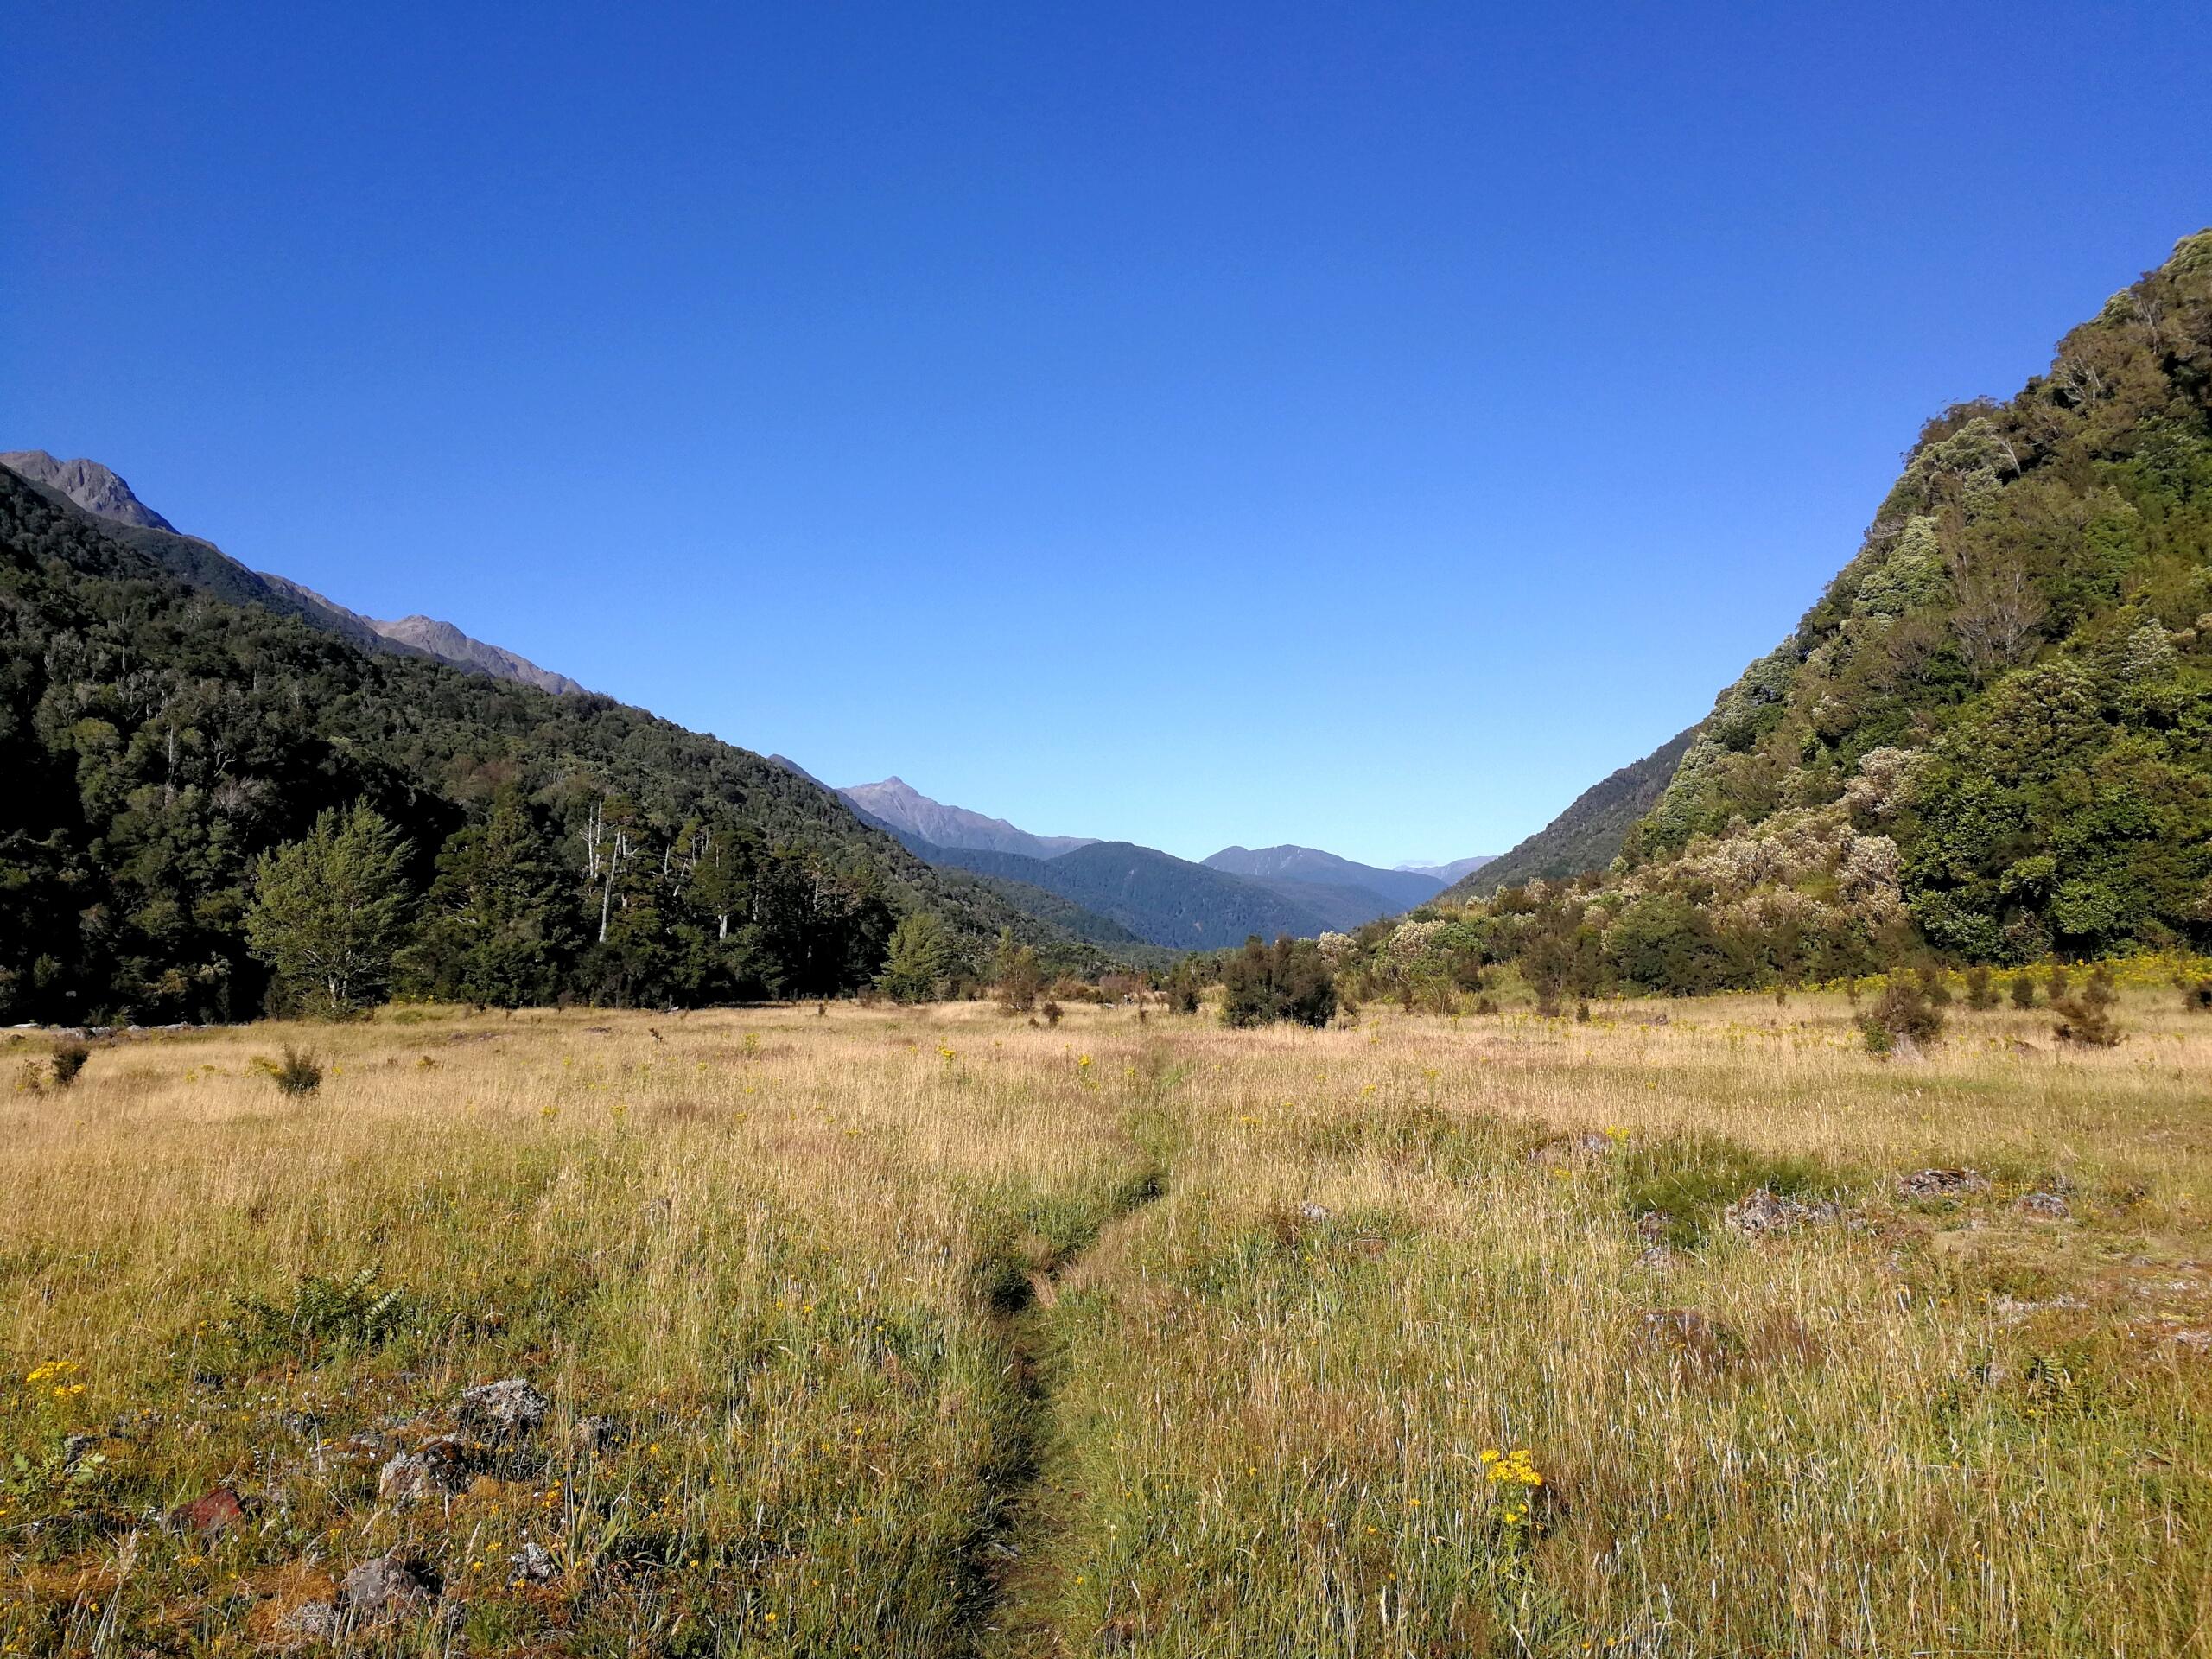 Te Araroa part 4 - Boyle to Arthur's Pass